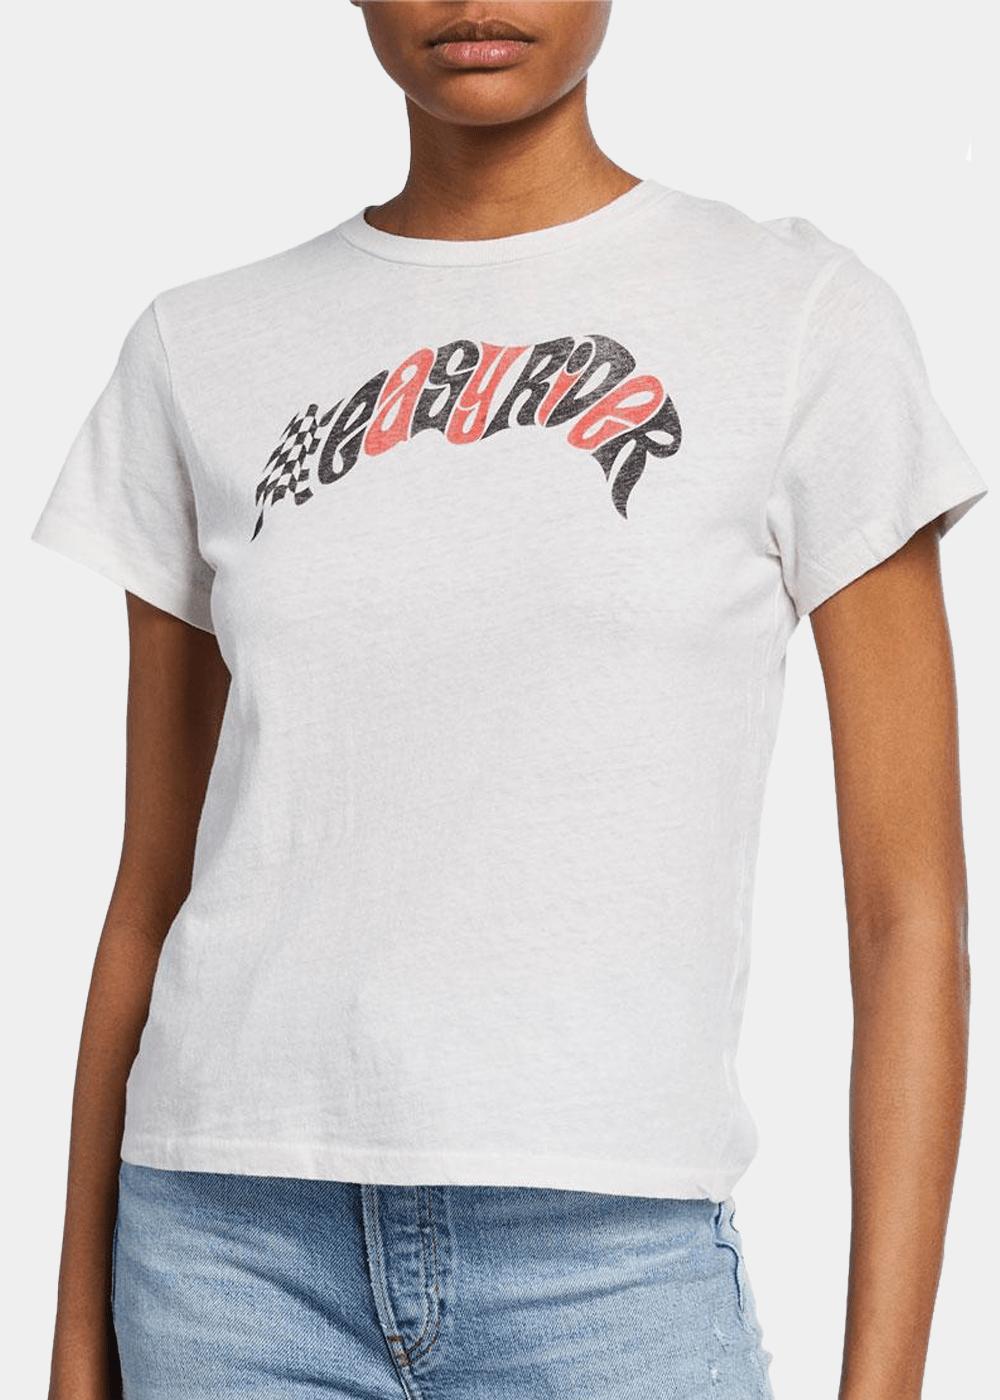 Camiseta-Redone-Easyrider